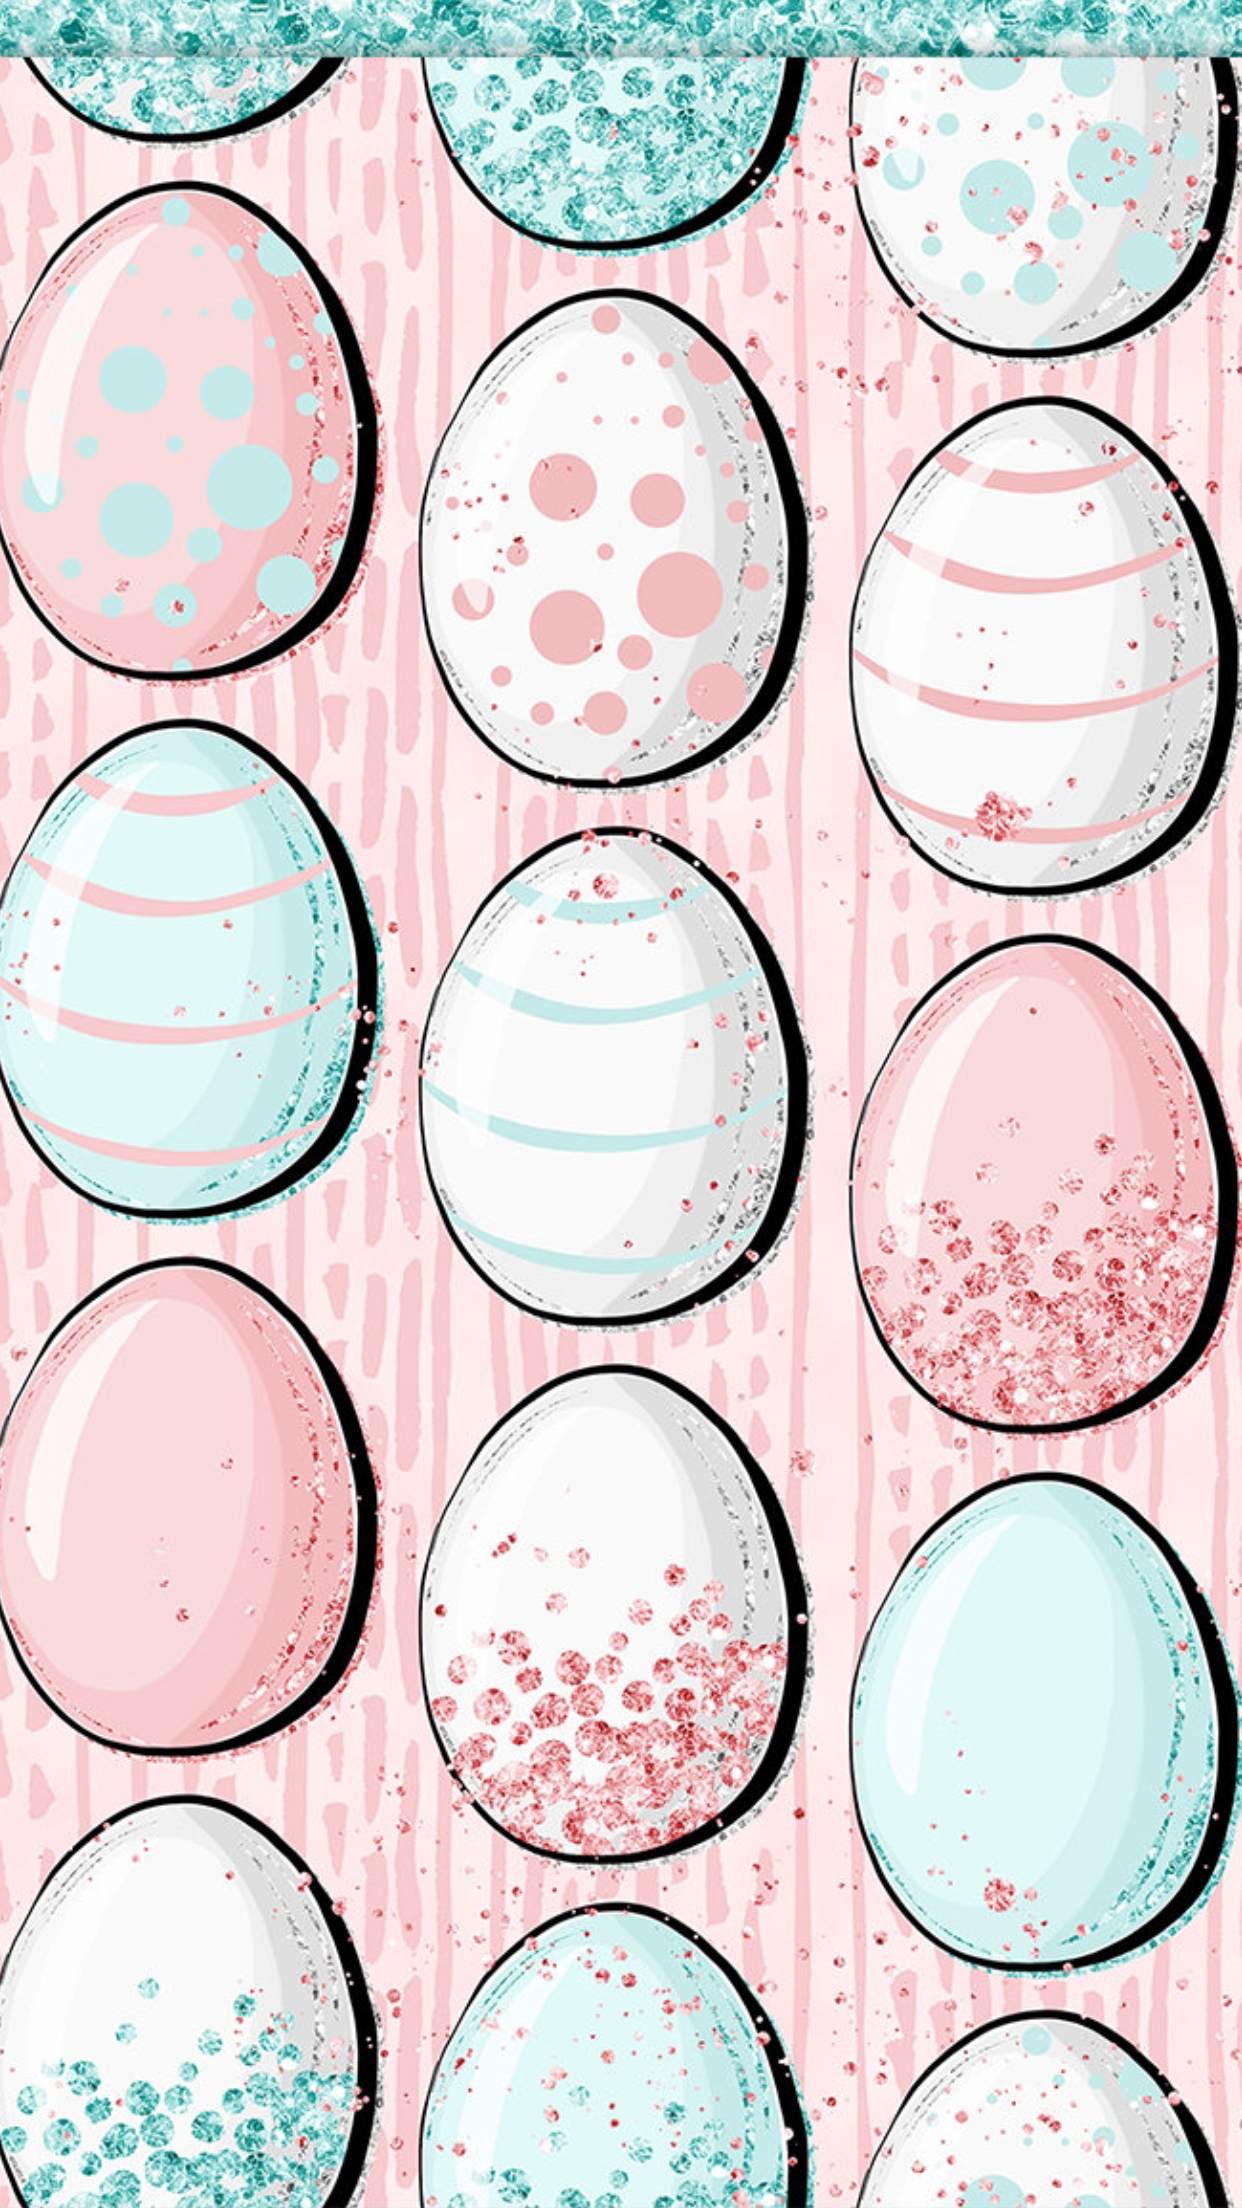 ᎥᏢhσnє Ꮃαllpαpєrѕ Iphone homescreen wallpaper, Easter